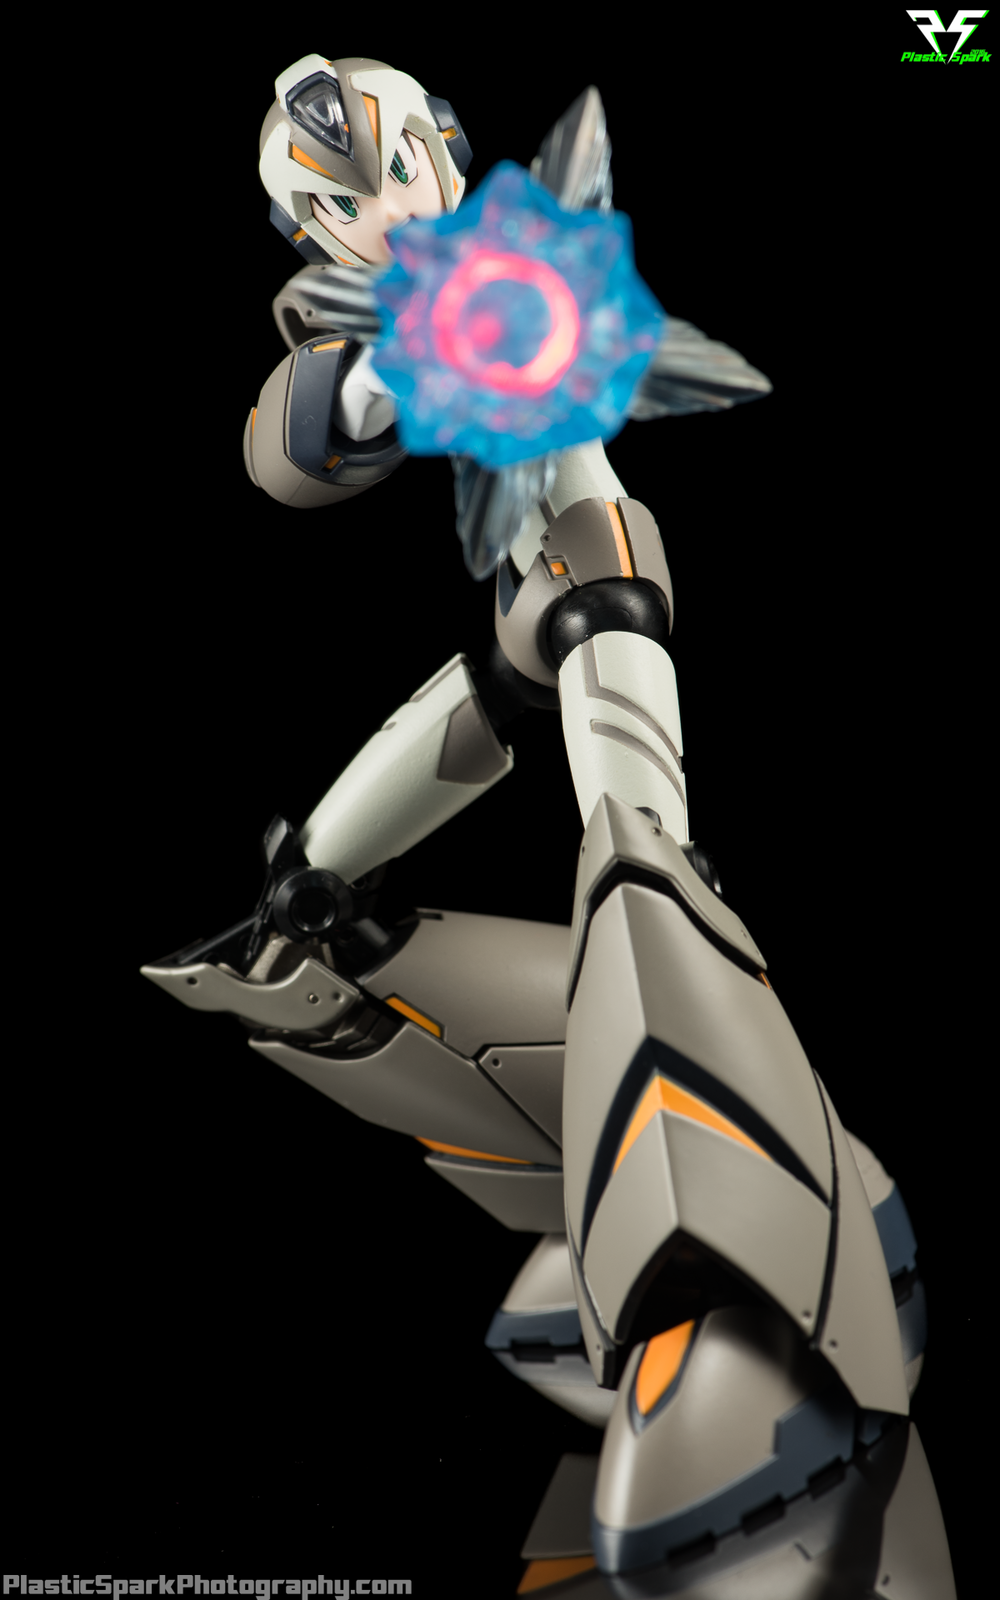 Truforce-Megaman-X-KS-Variant-(7-of-9).png